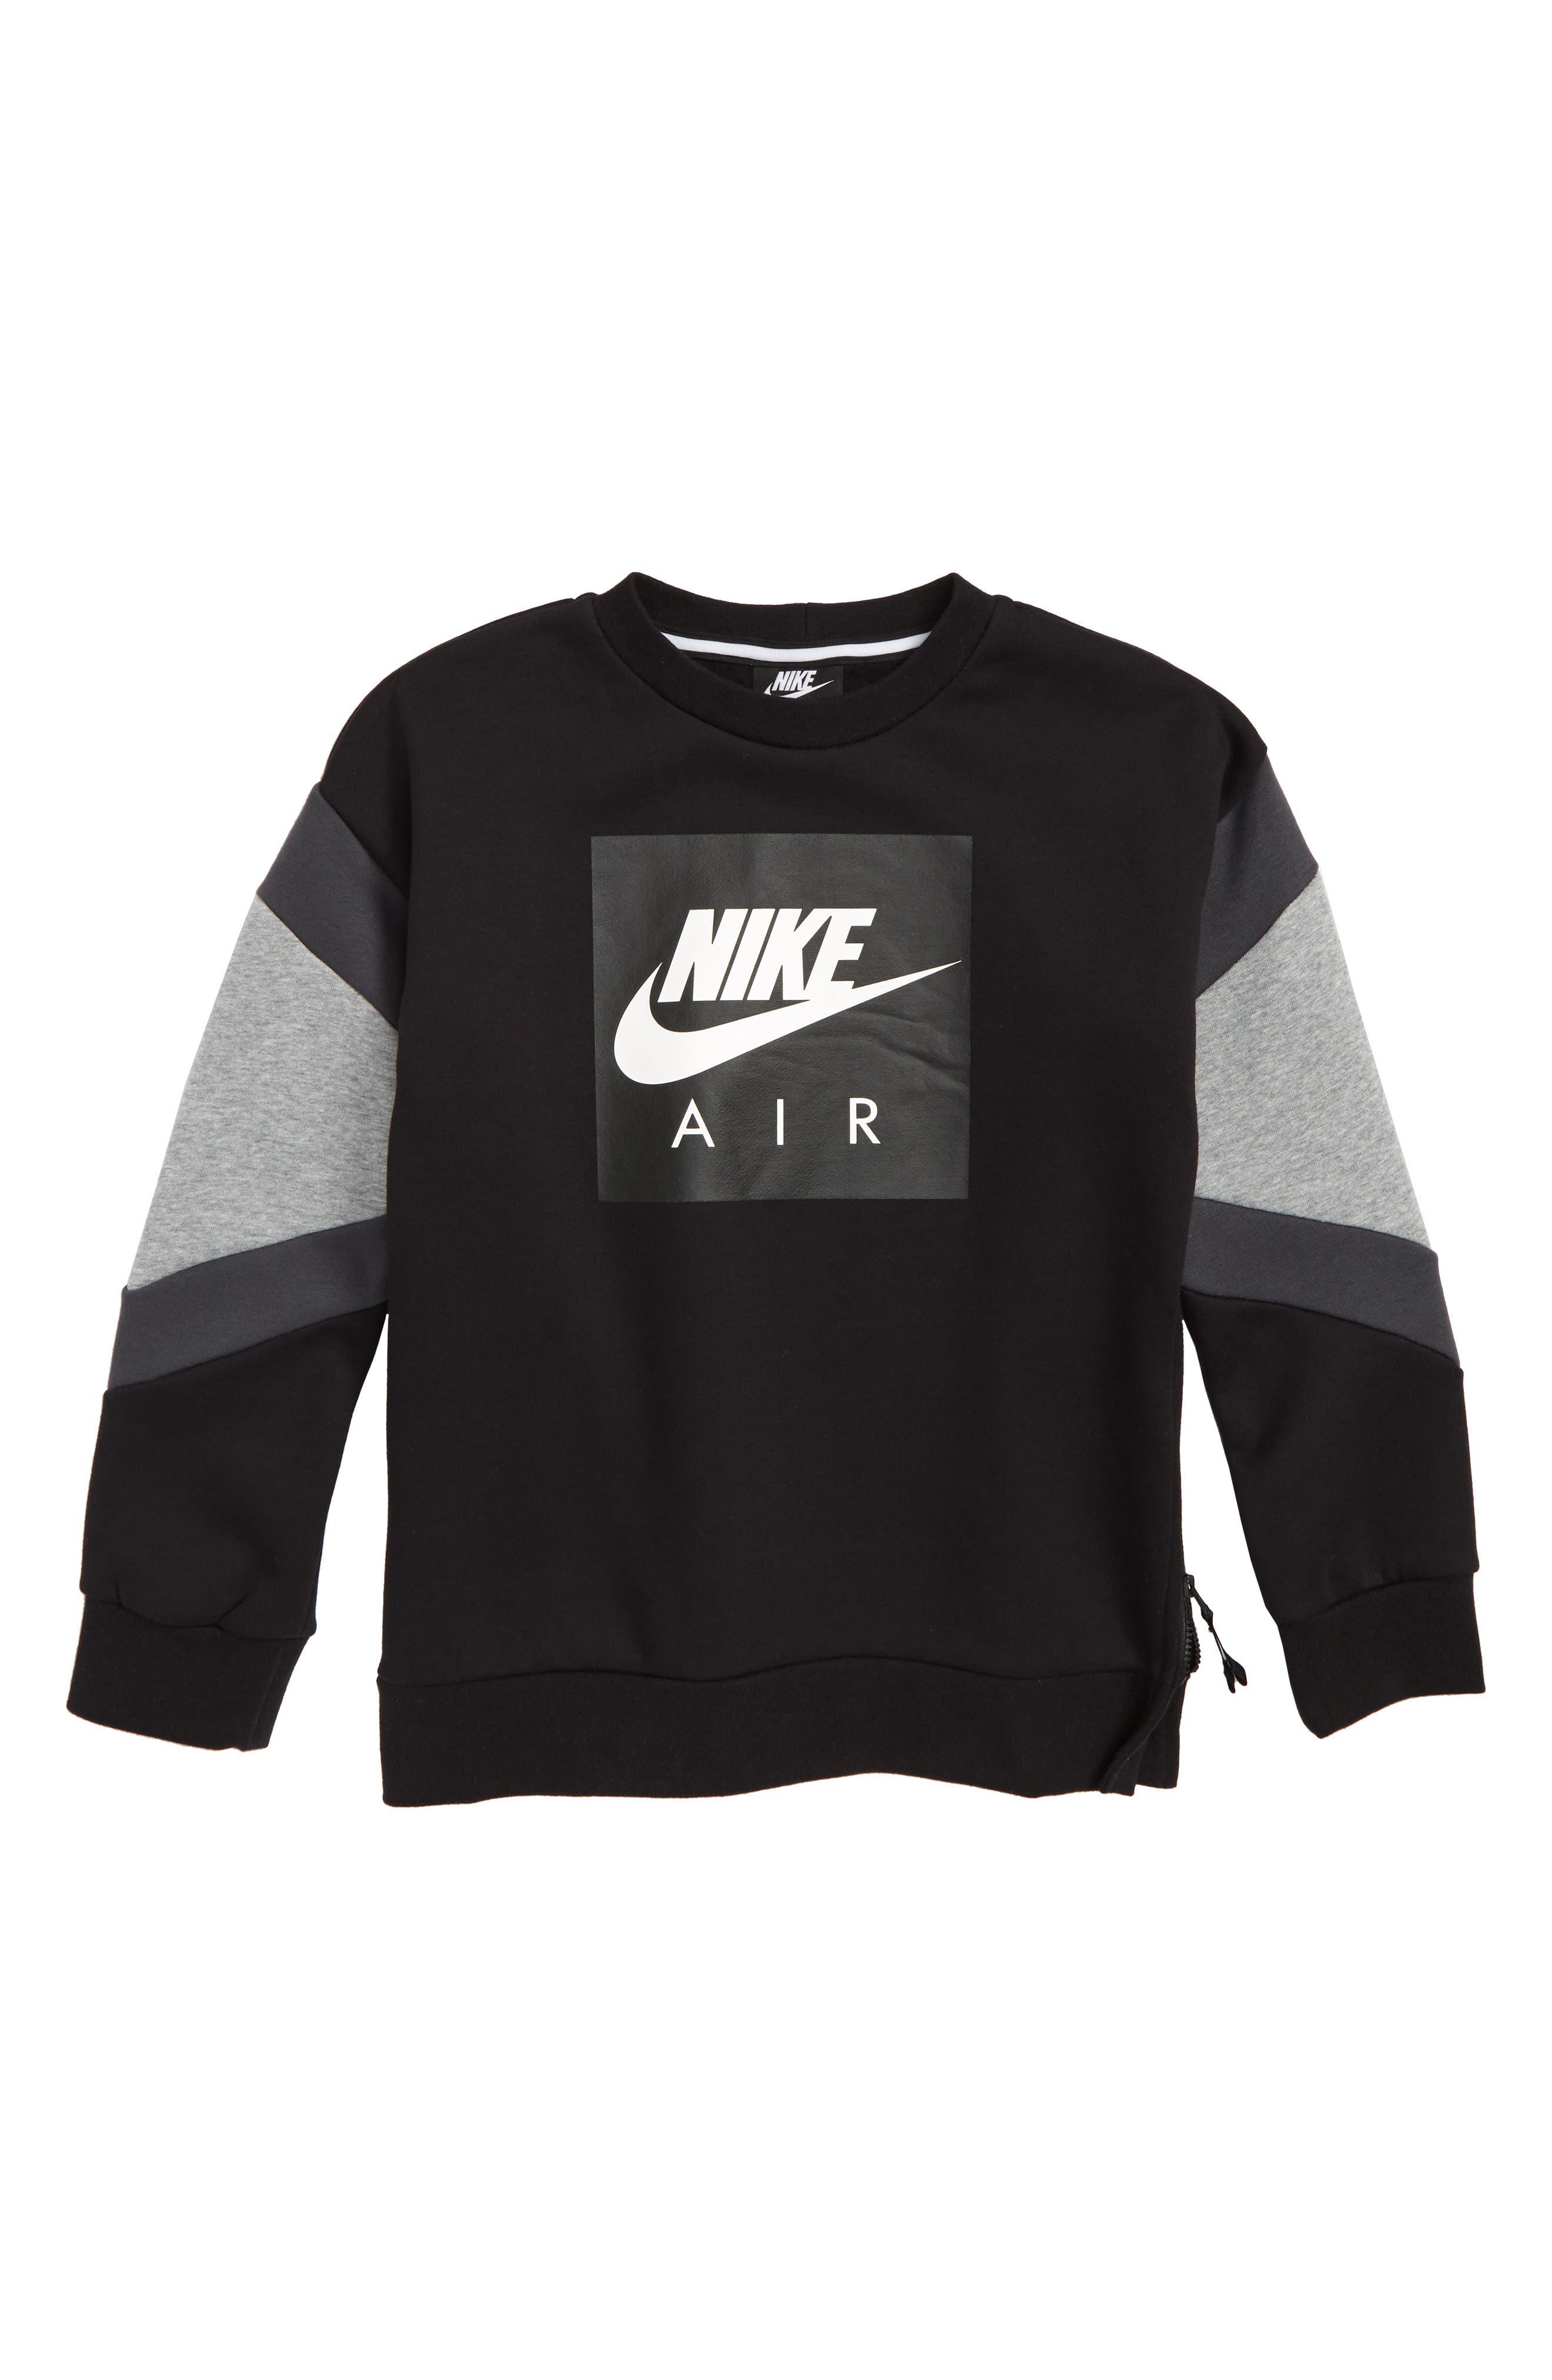 Air Sweatshirt,                             Main thumbnail 1, color,                             BLACK/ DARK GREY HEATHER